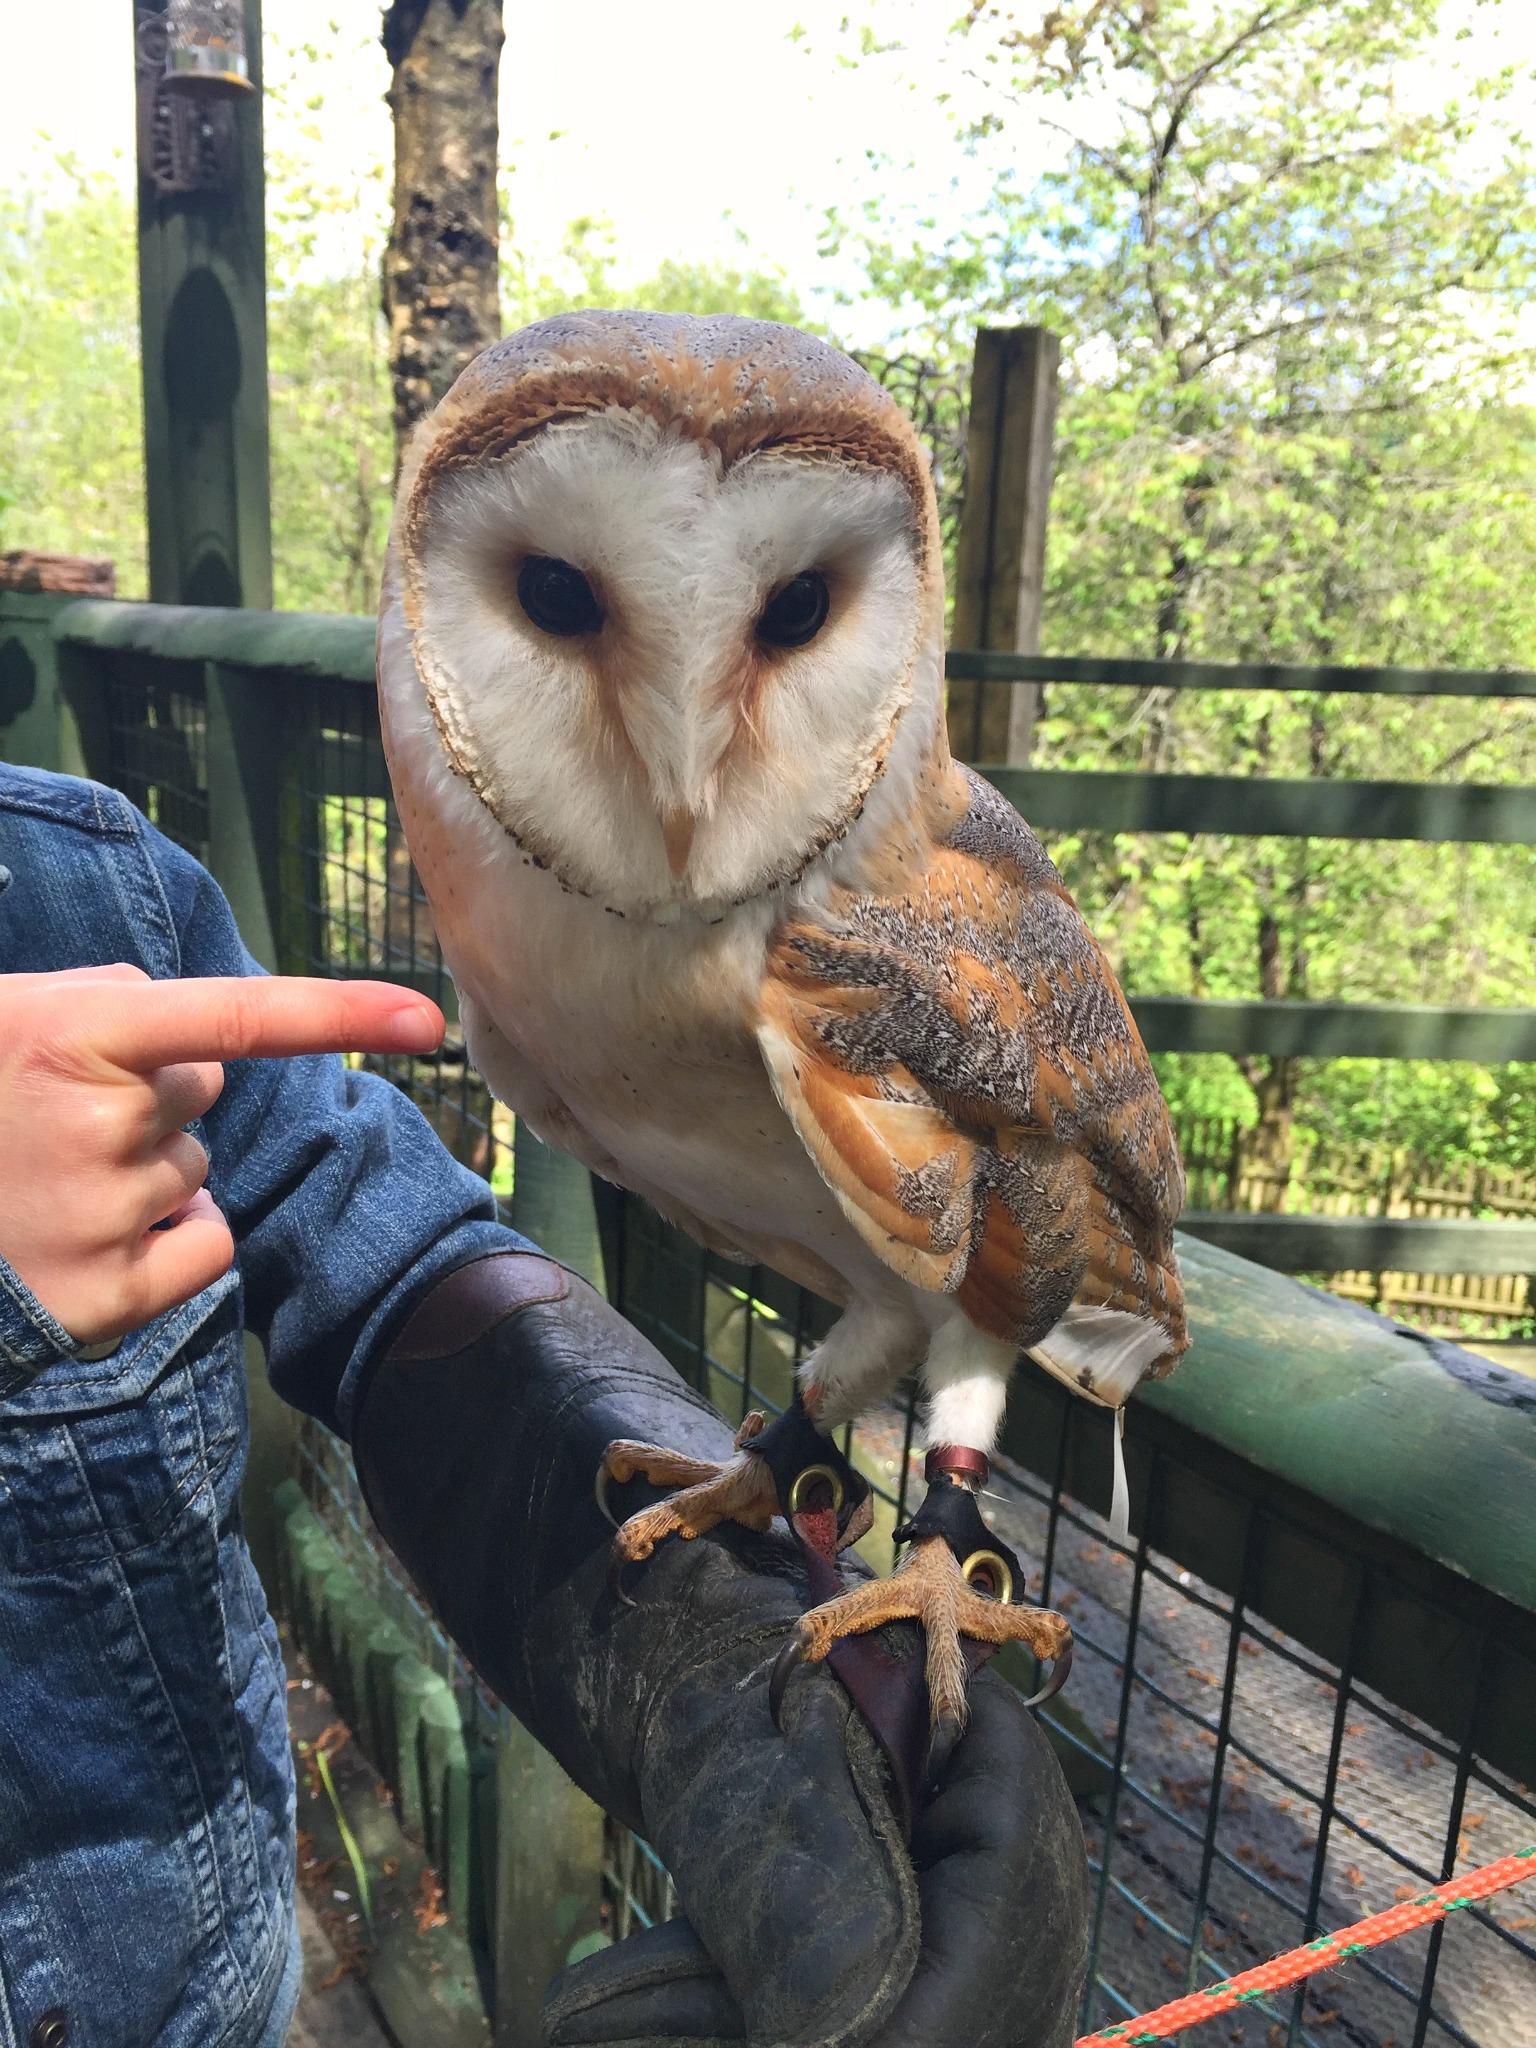 Ebbw Vale Owl Sanctuary